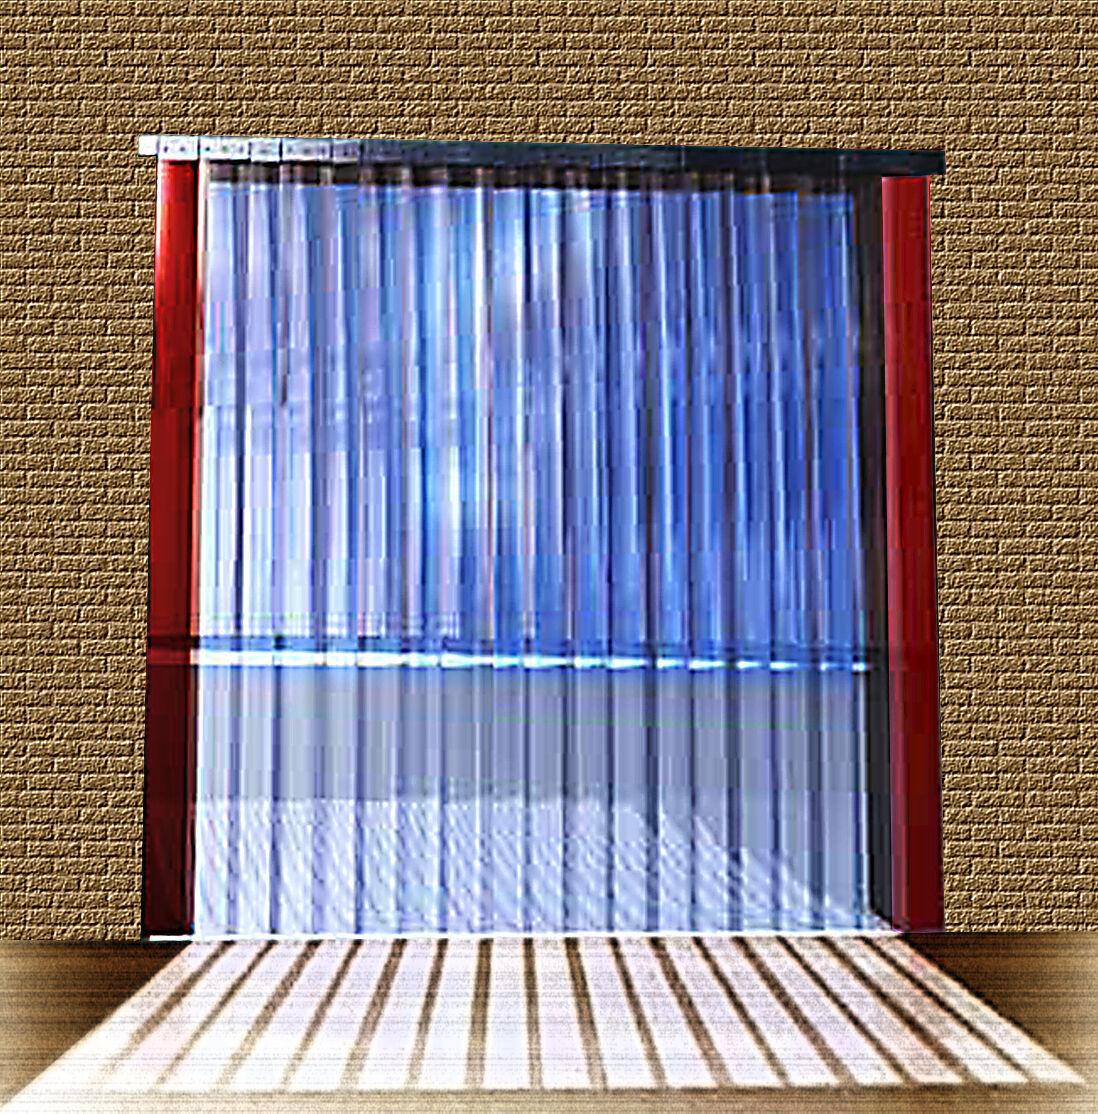 B 0 85m x H1 75m Lamellen Lamellen Lamellen PVC Streifen Vorhang 200x2mm 21ad8d